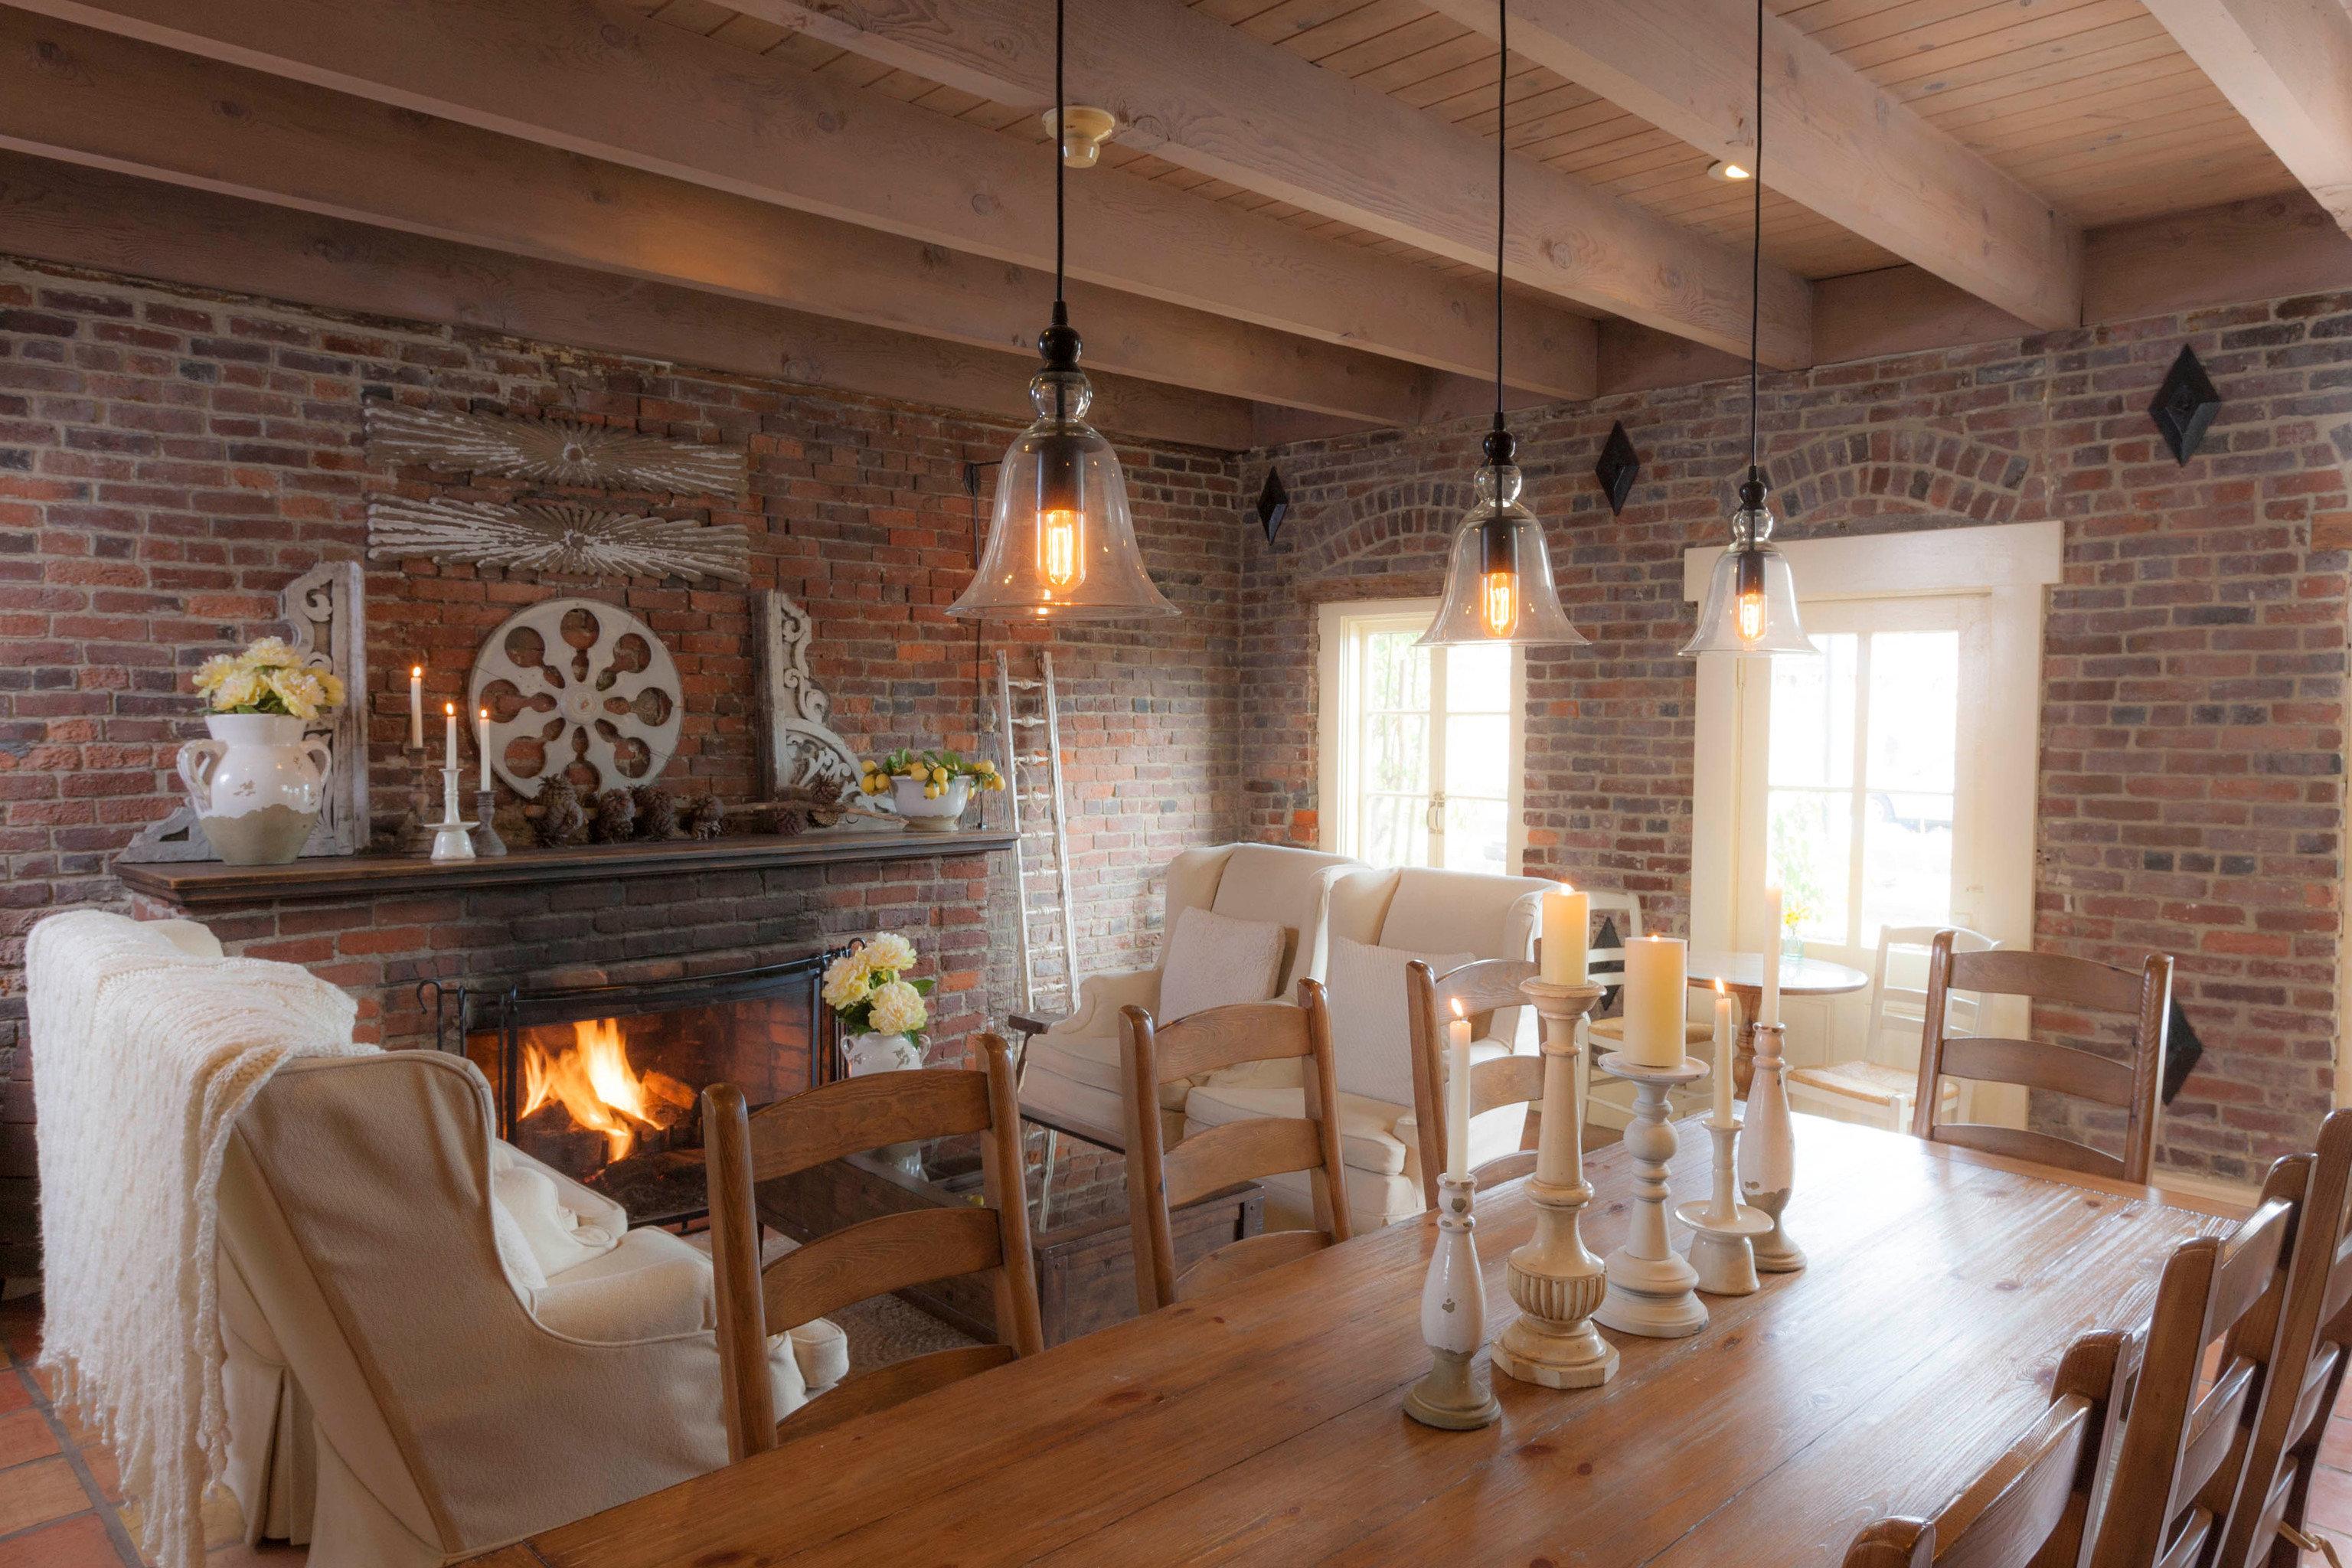 Fireplace living room fire beam hearth flooring home loft wood flooring hardwood interior designer